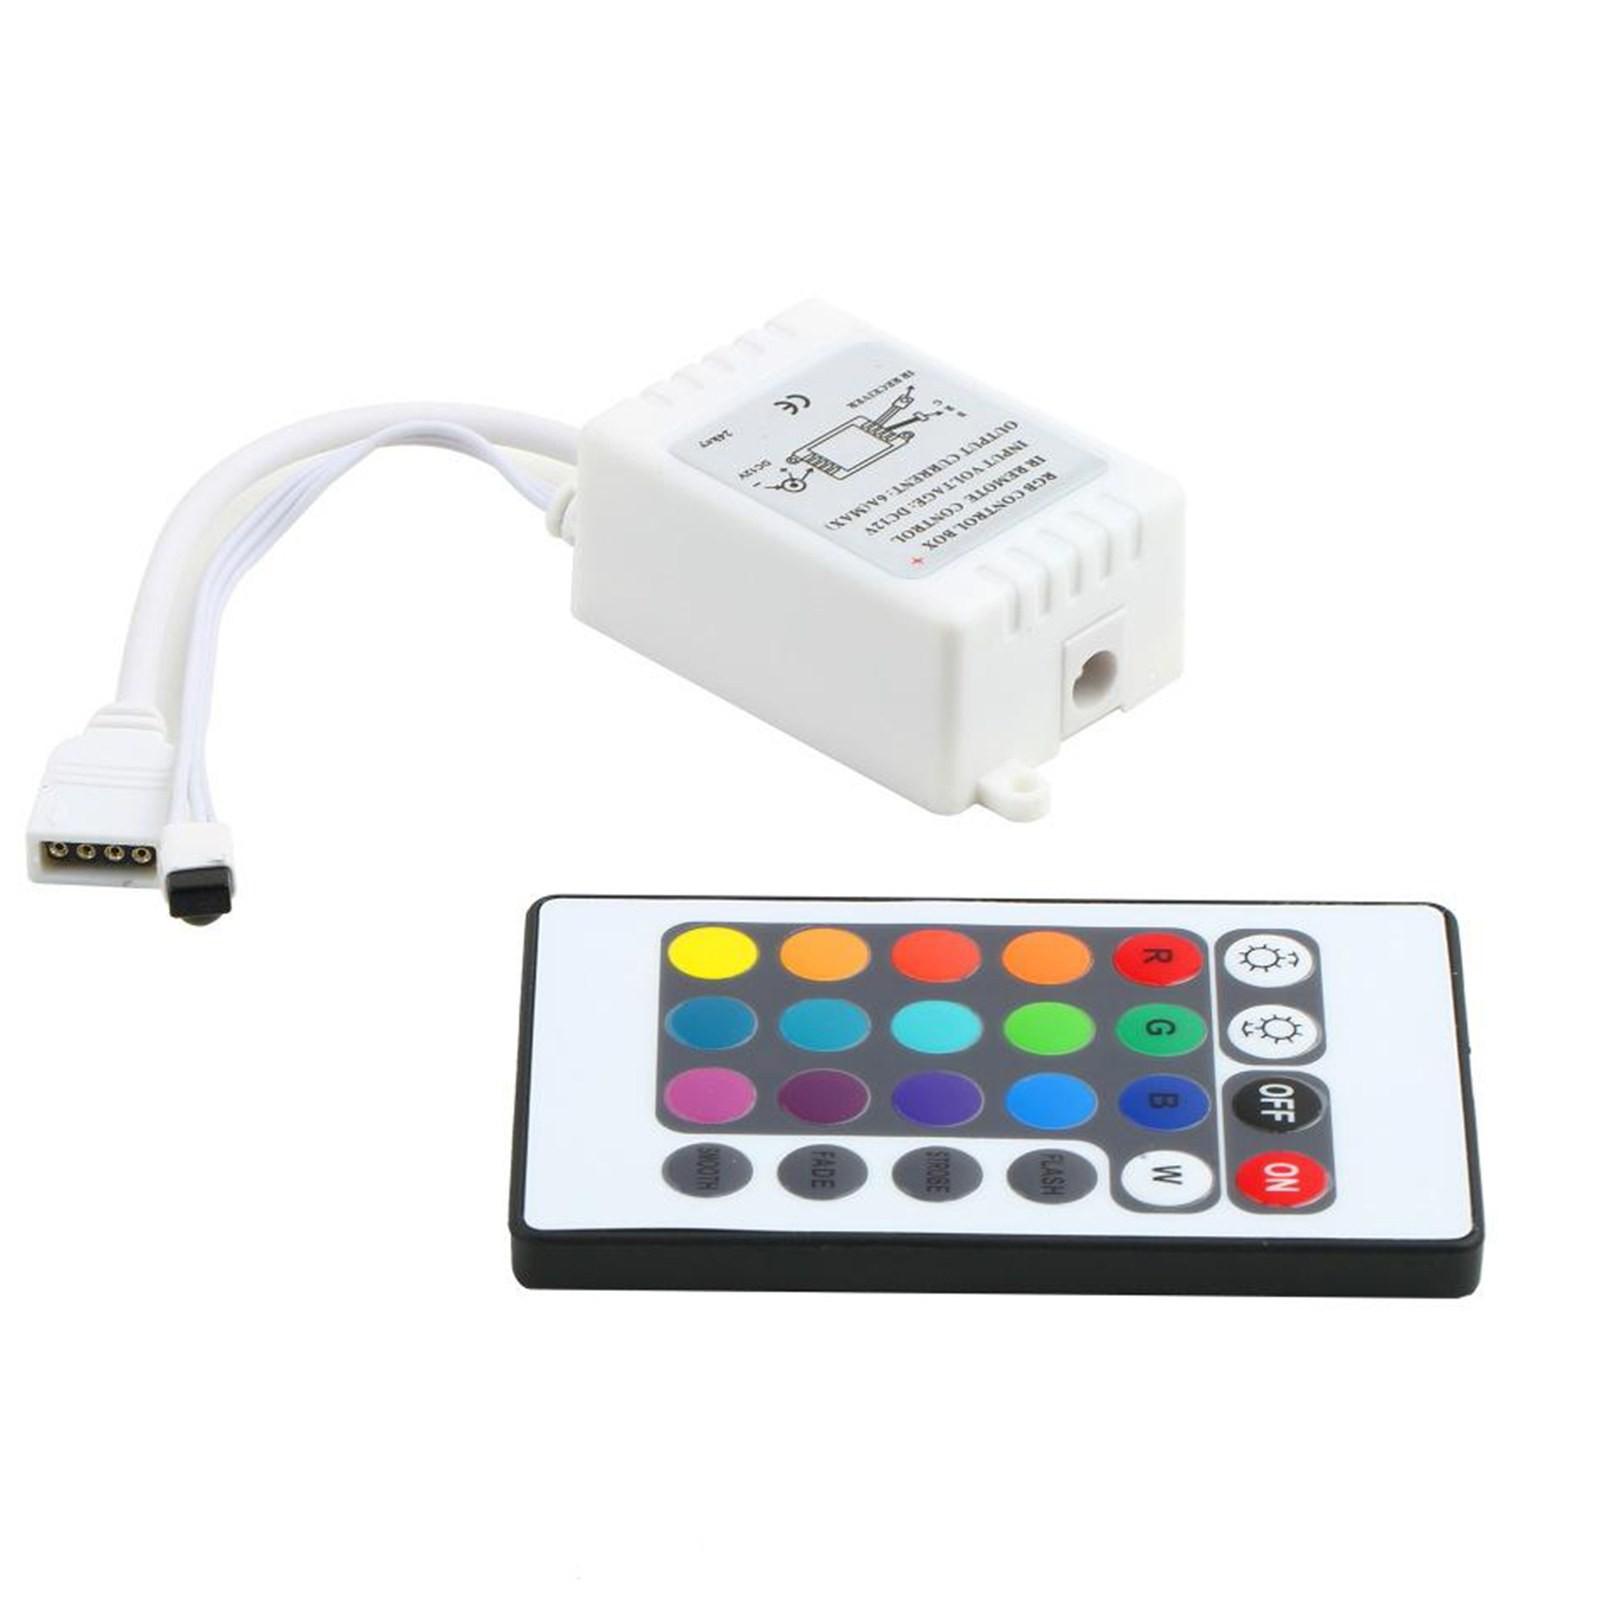 Telecomando controller per striscia a led rgb multicolore for Striscia led rgb